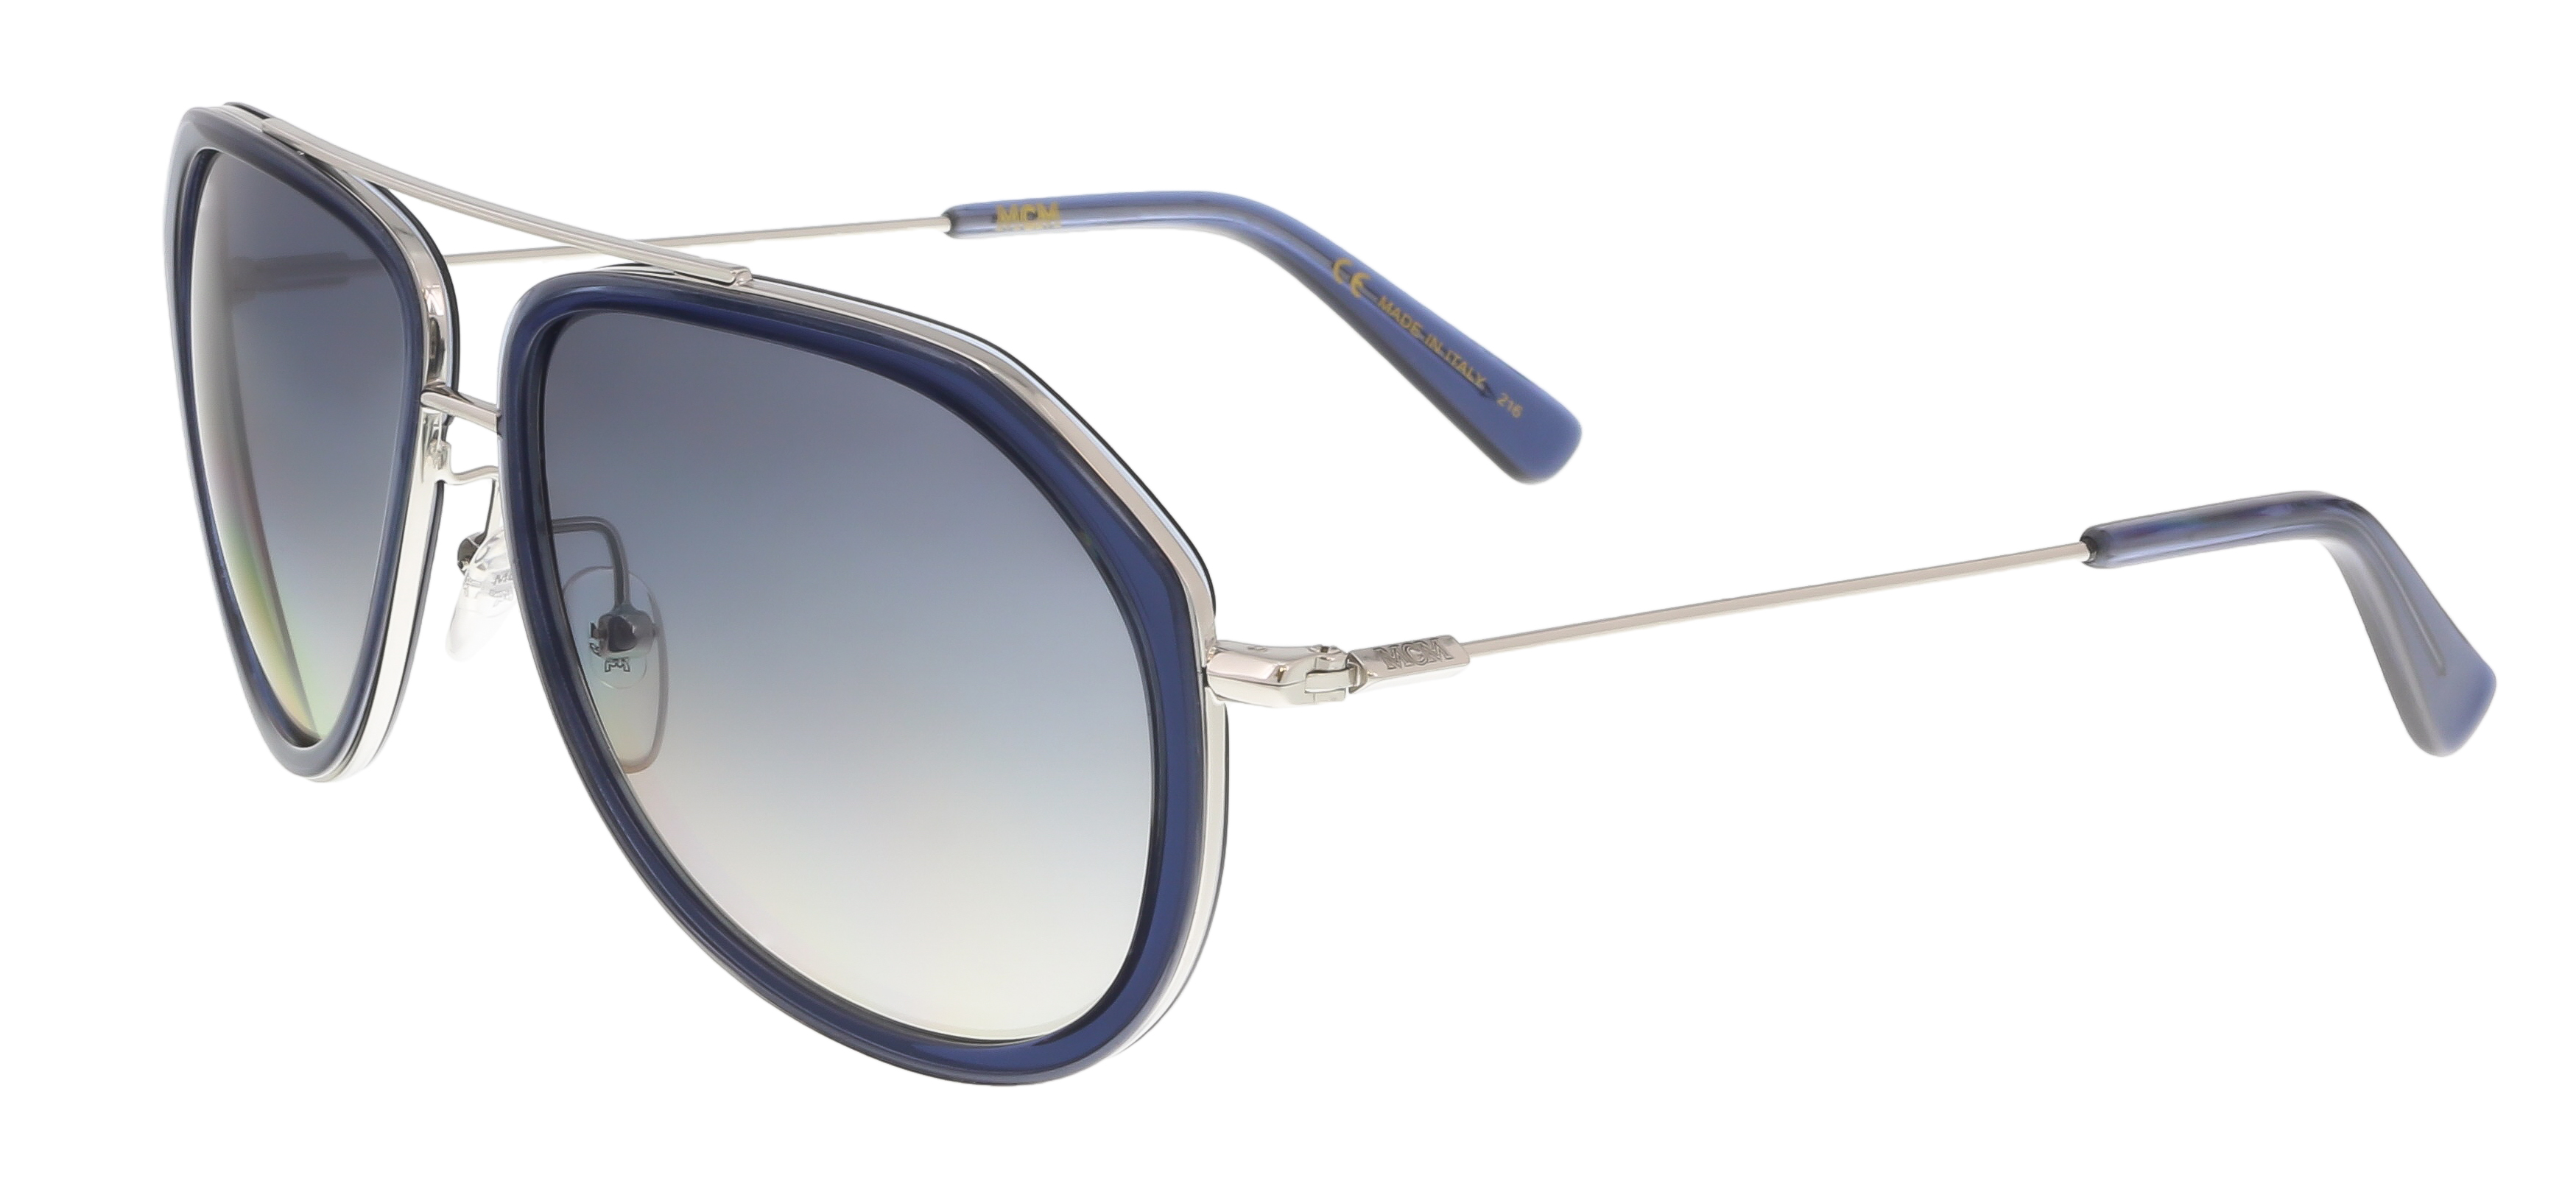 MCM613S 424 Blue Aviator Feline Sunglasses